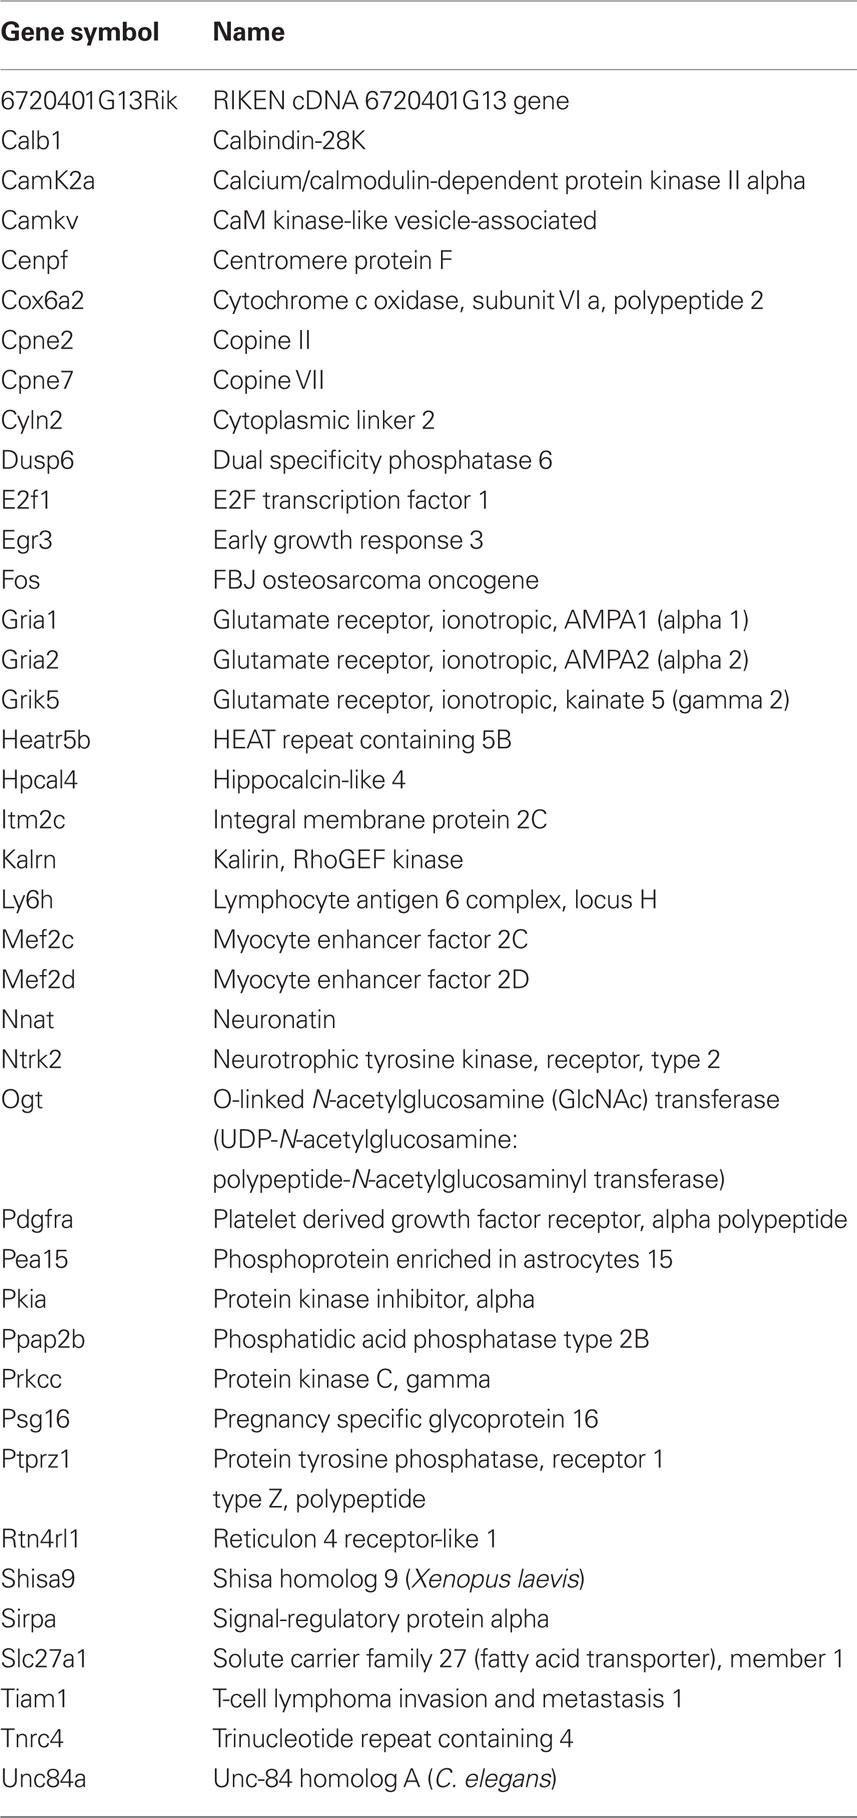 Commercial Electrical Symbols Pattern ne gene symbols and